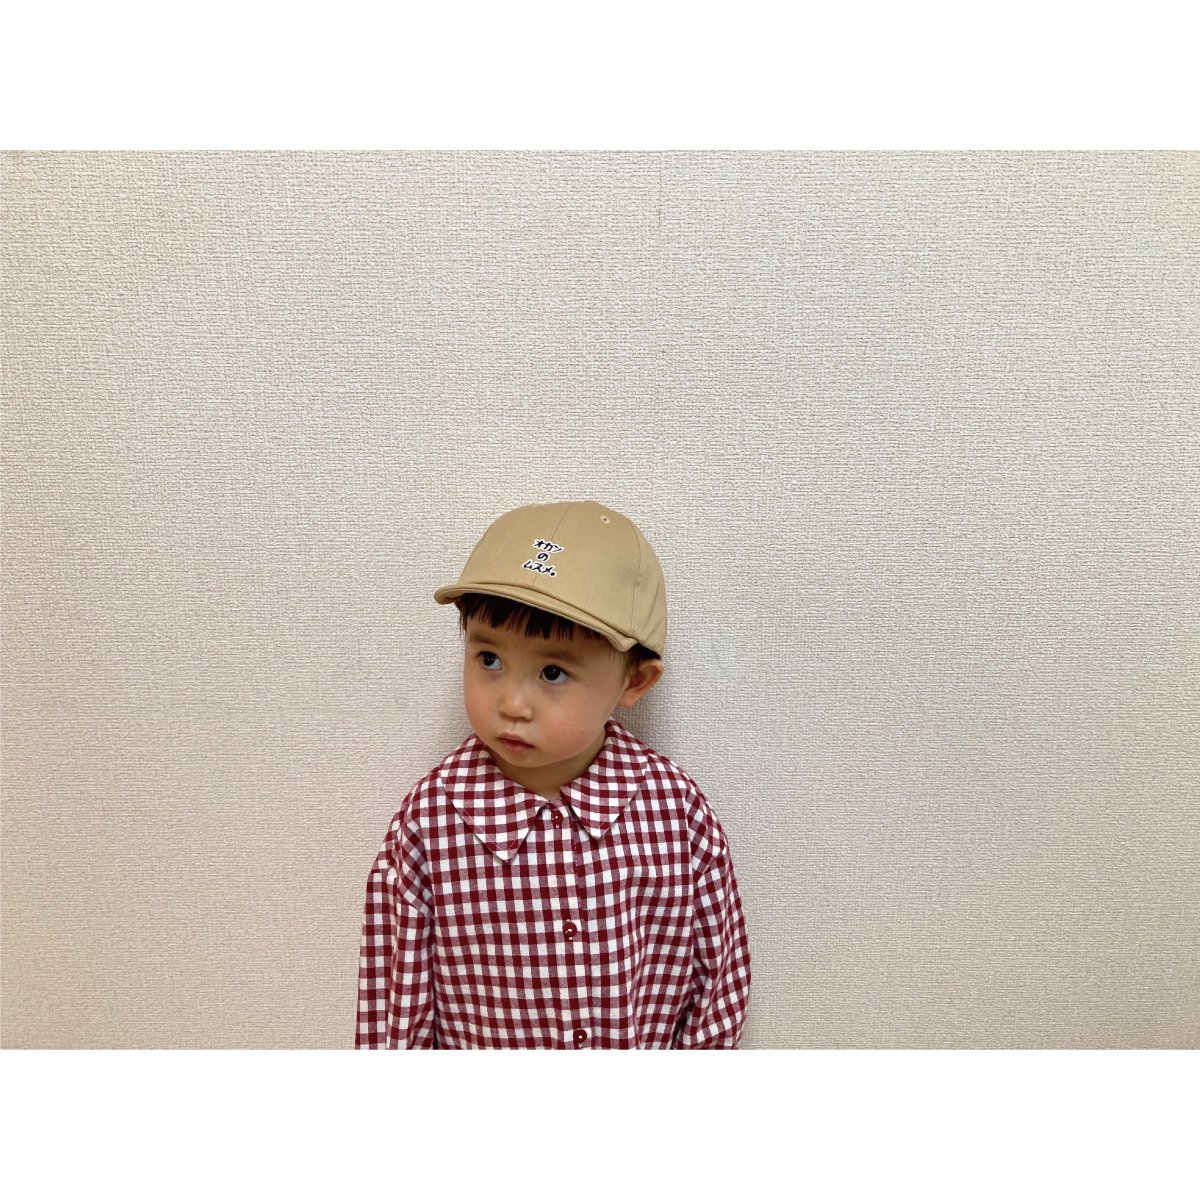 O2M2 Kids Shisyu Cap 詳細画像27